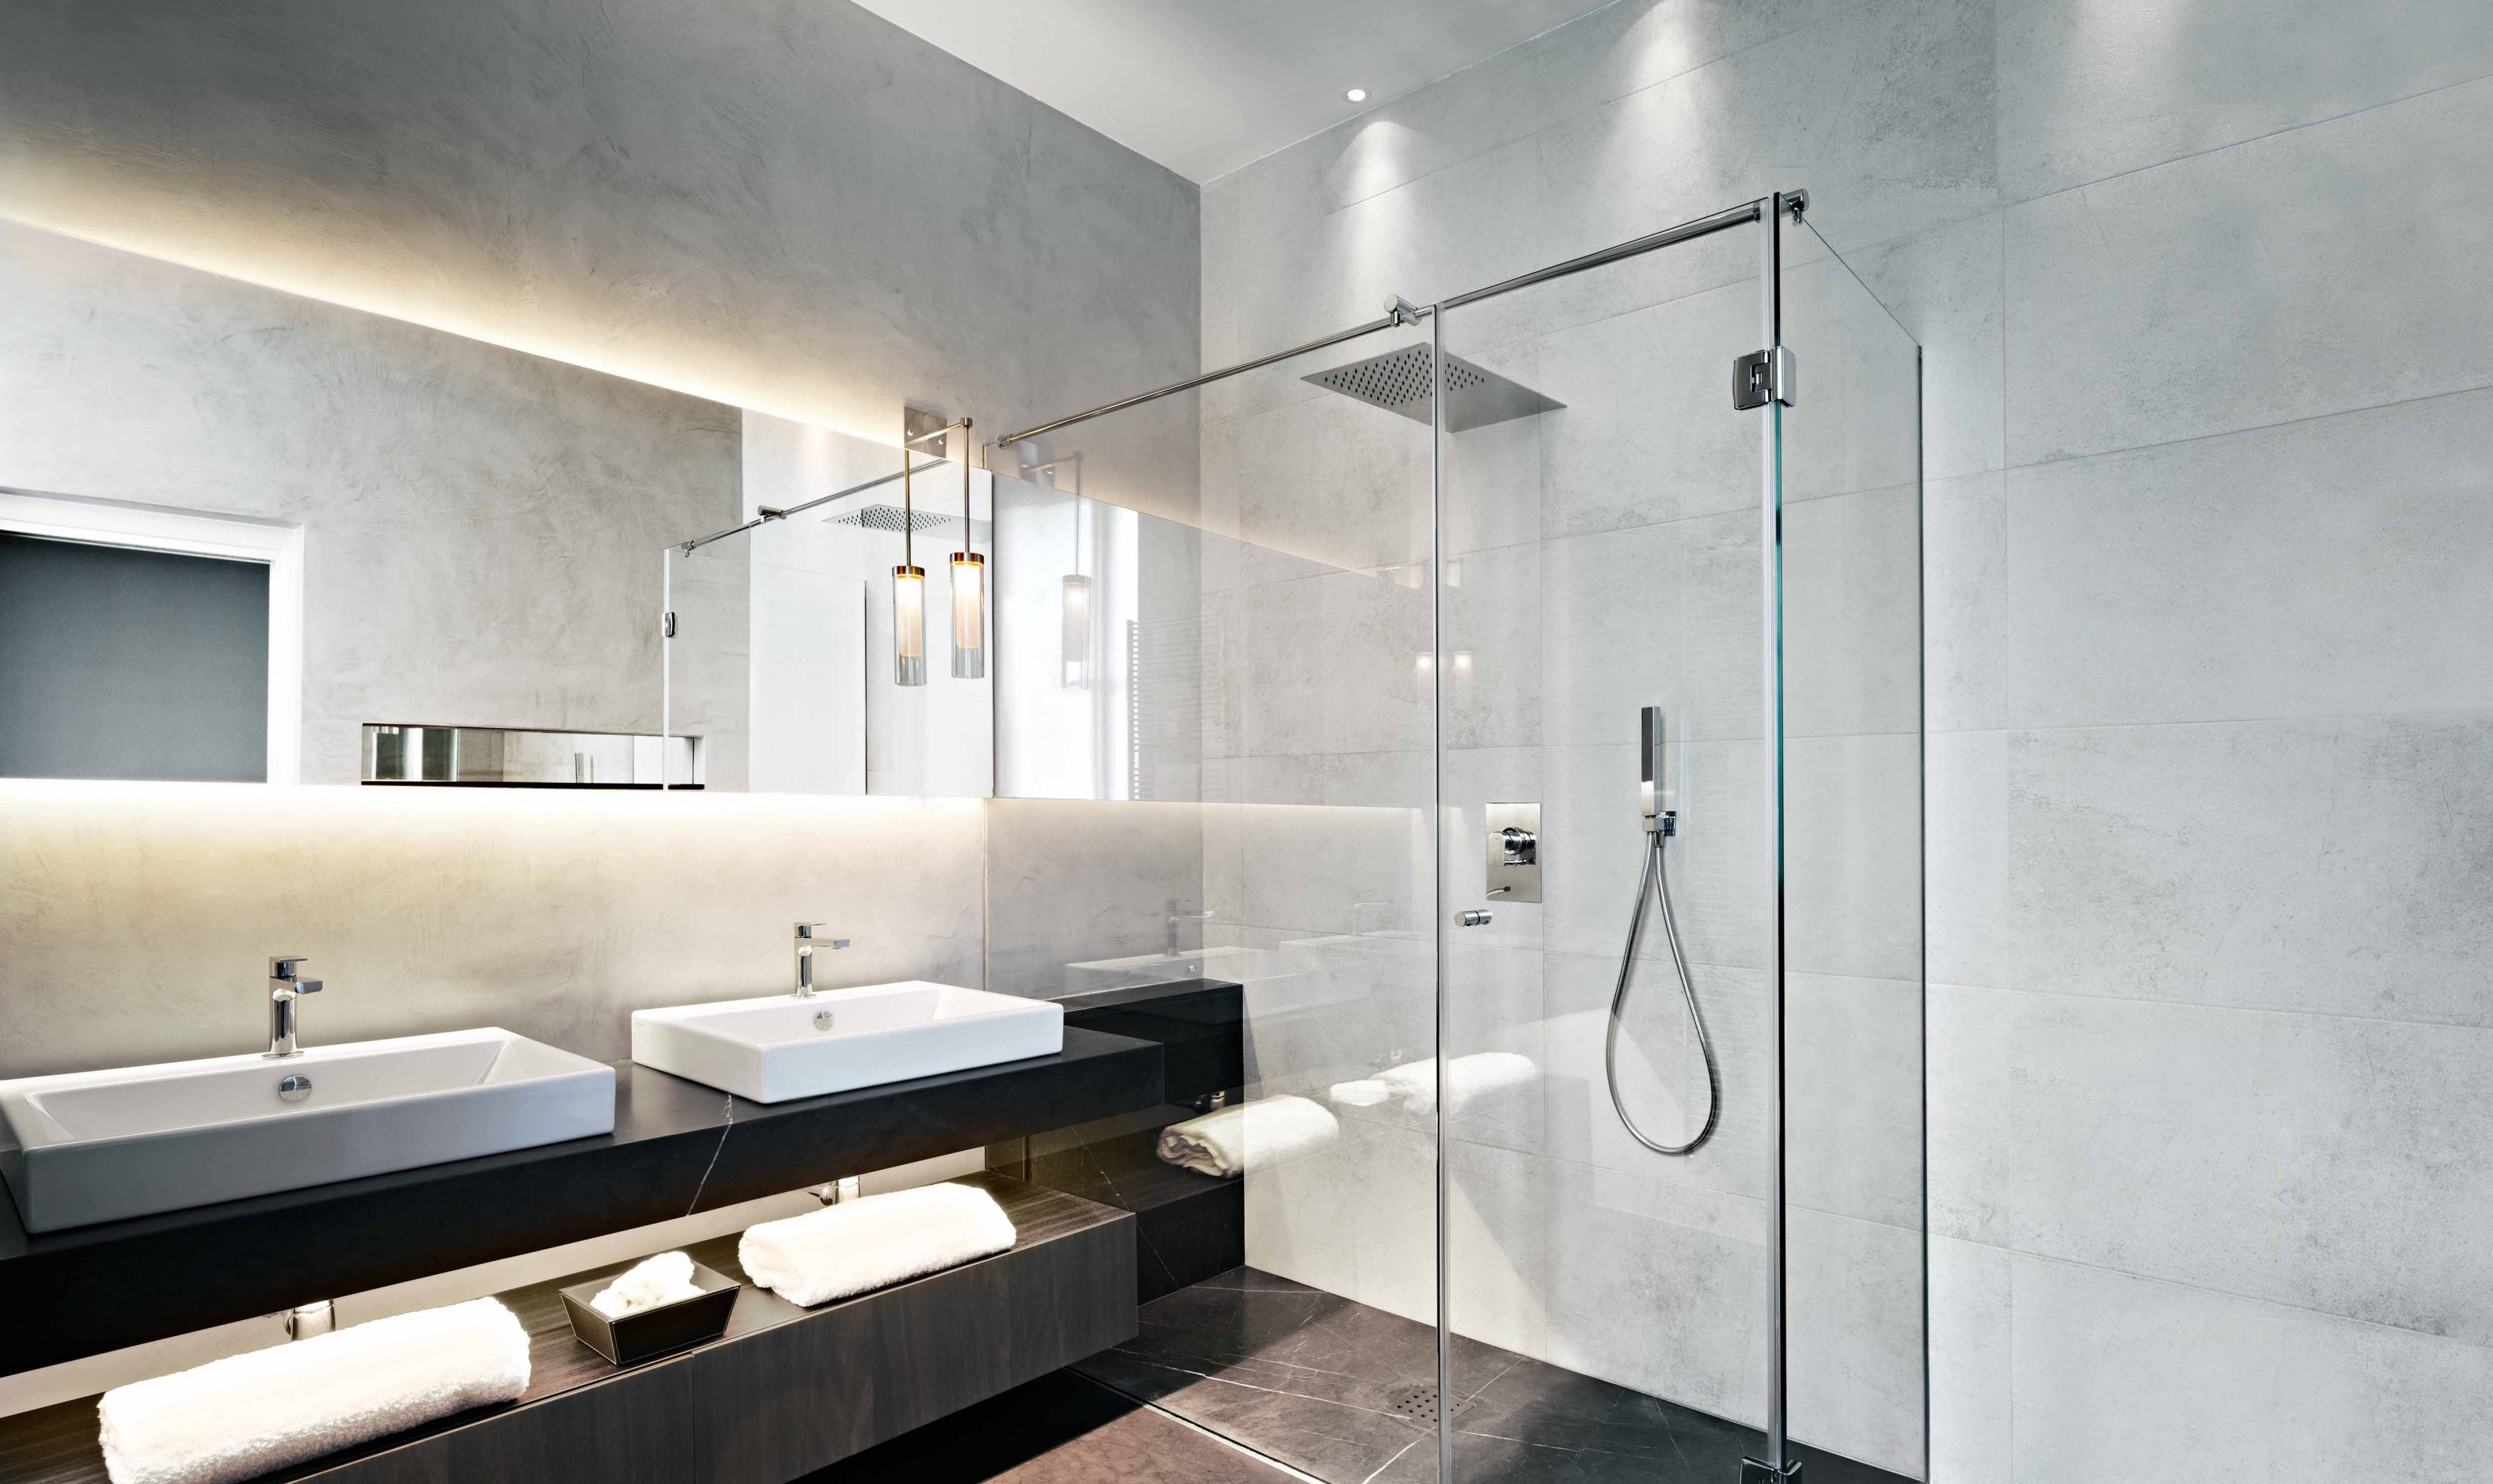 High Ceiling Bathroom John Cullen